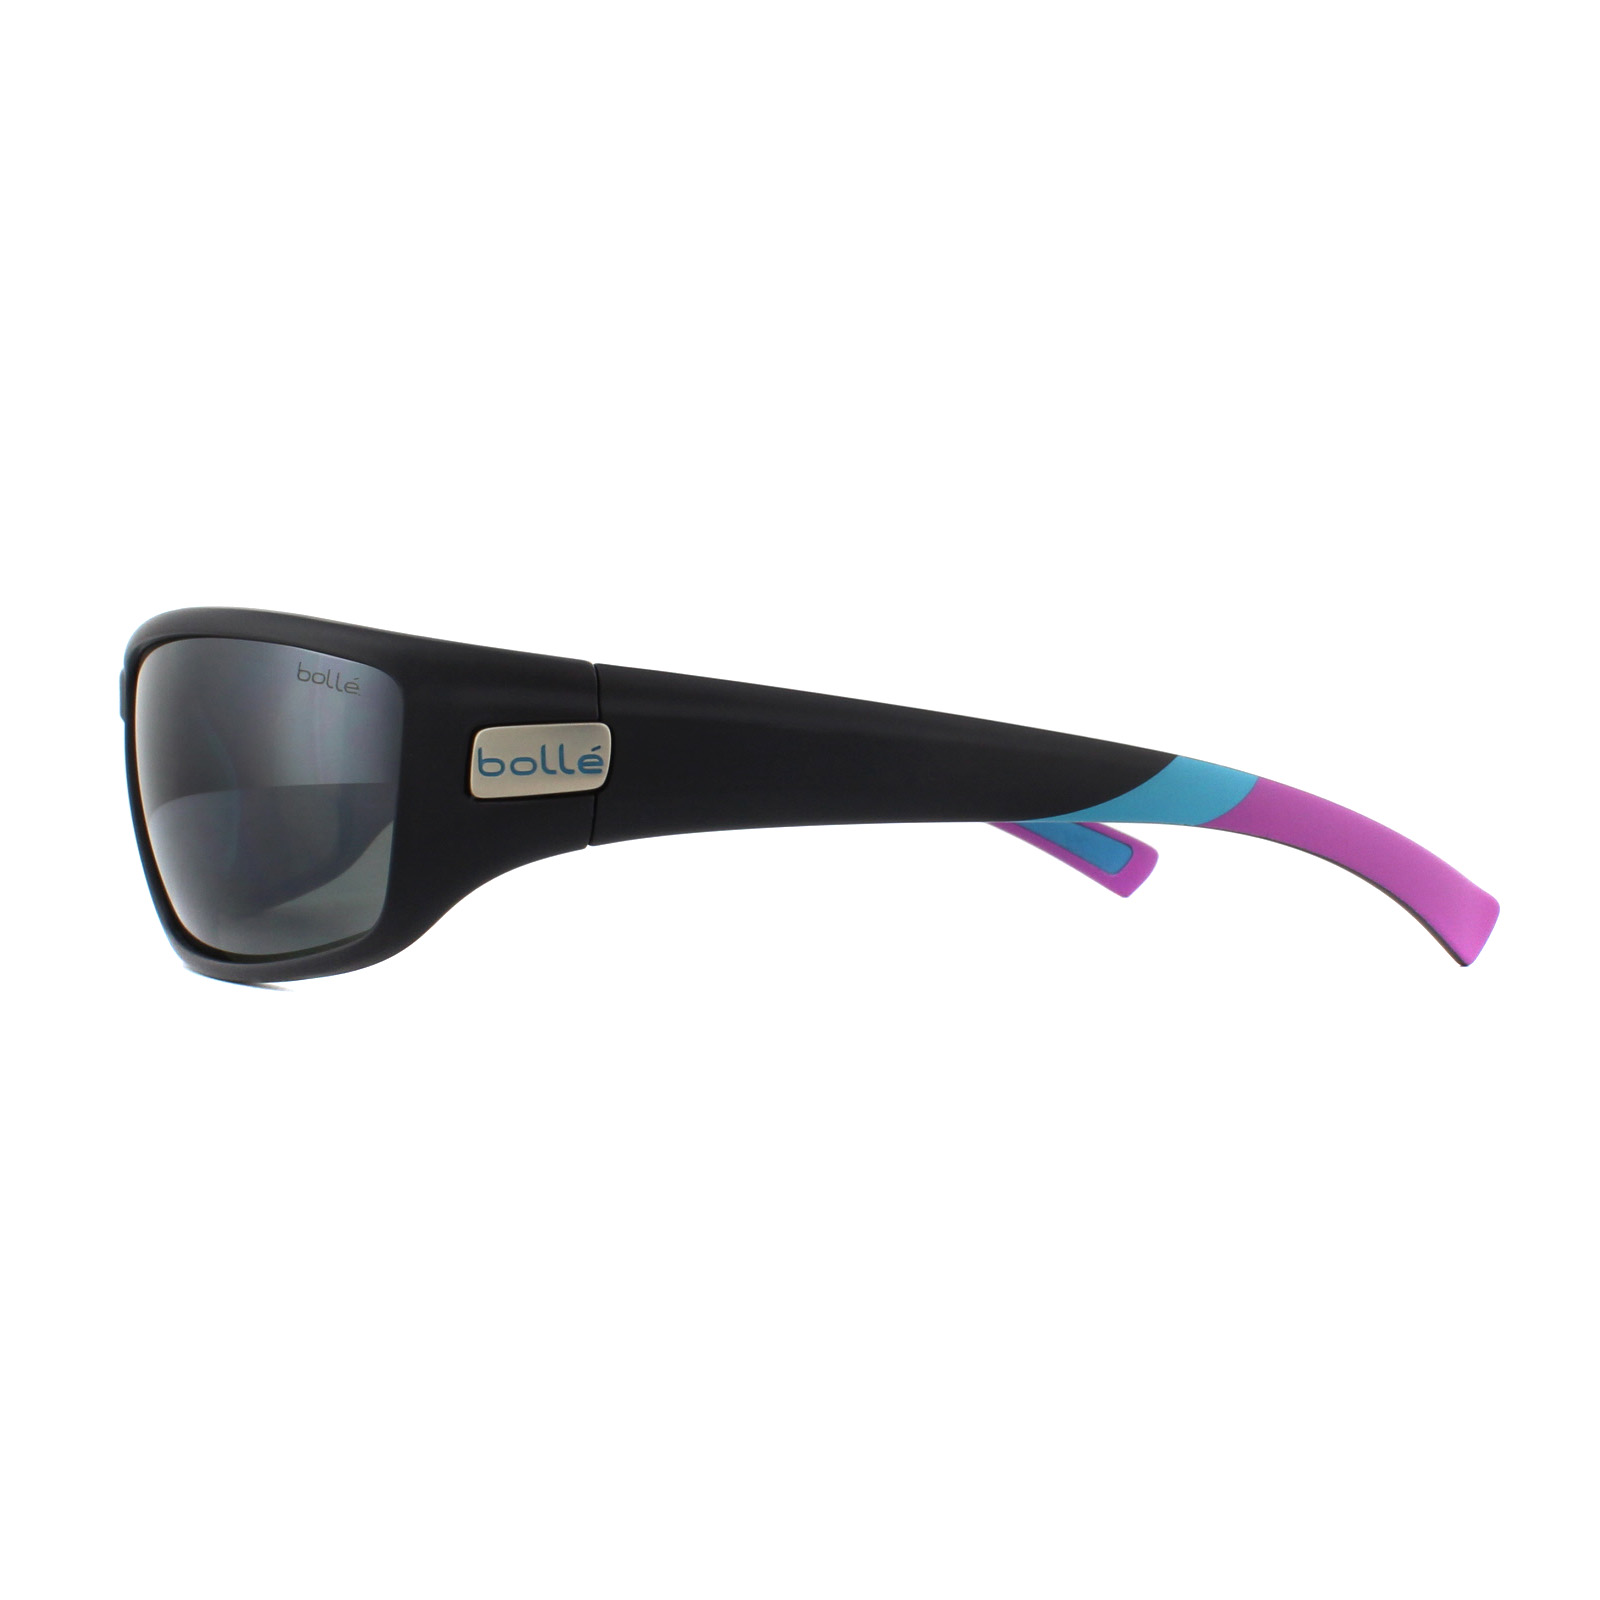 12435 Bolle Python Polarized Oleophobic Women/'s Sunglasses w// Gun Flash Lens